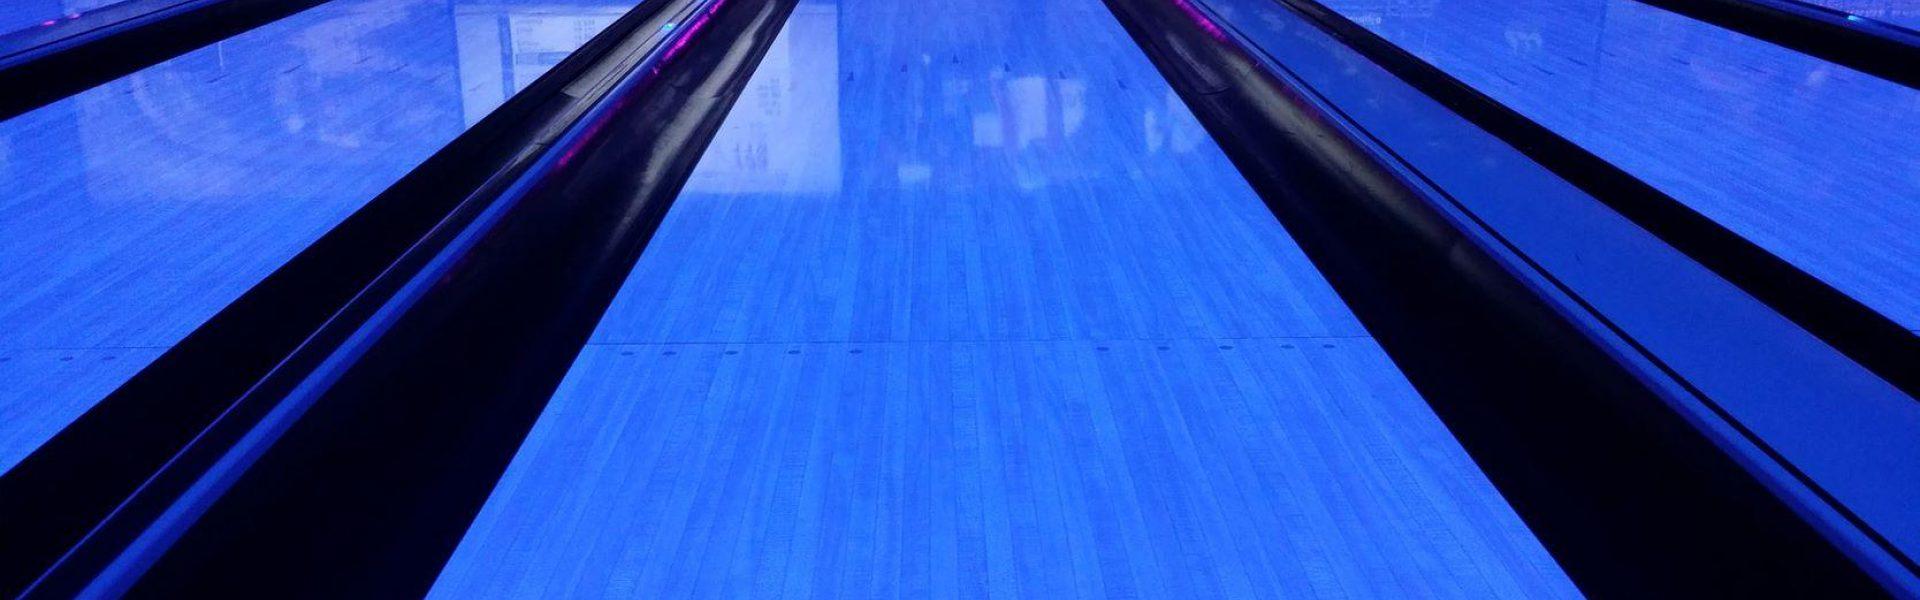 Blue lanes